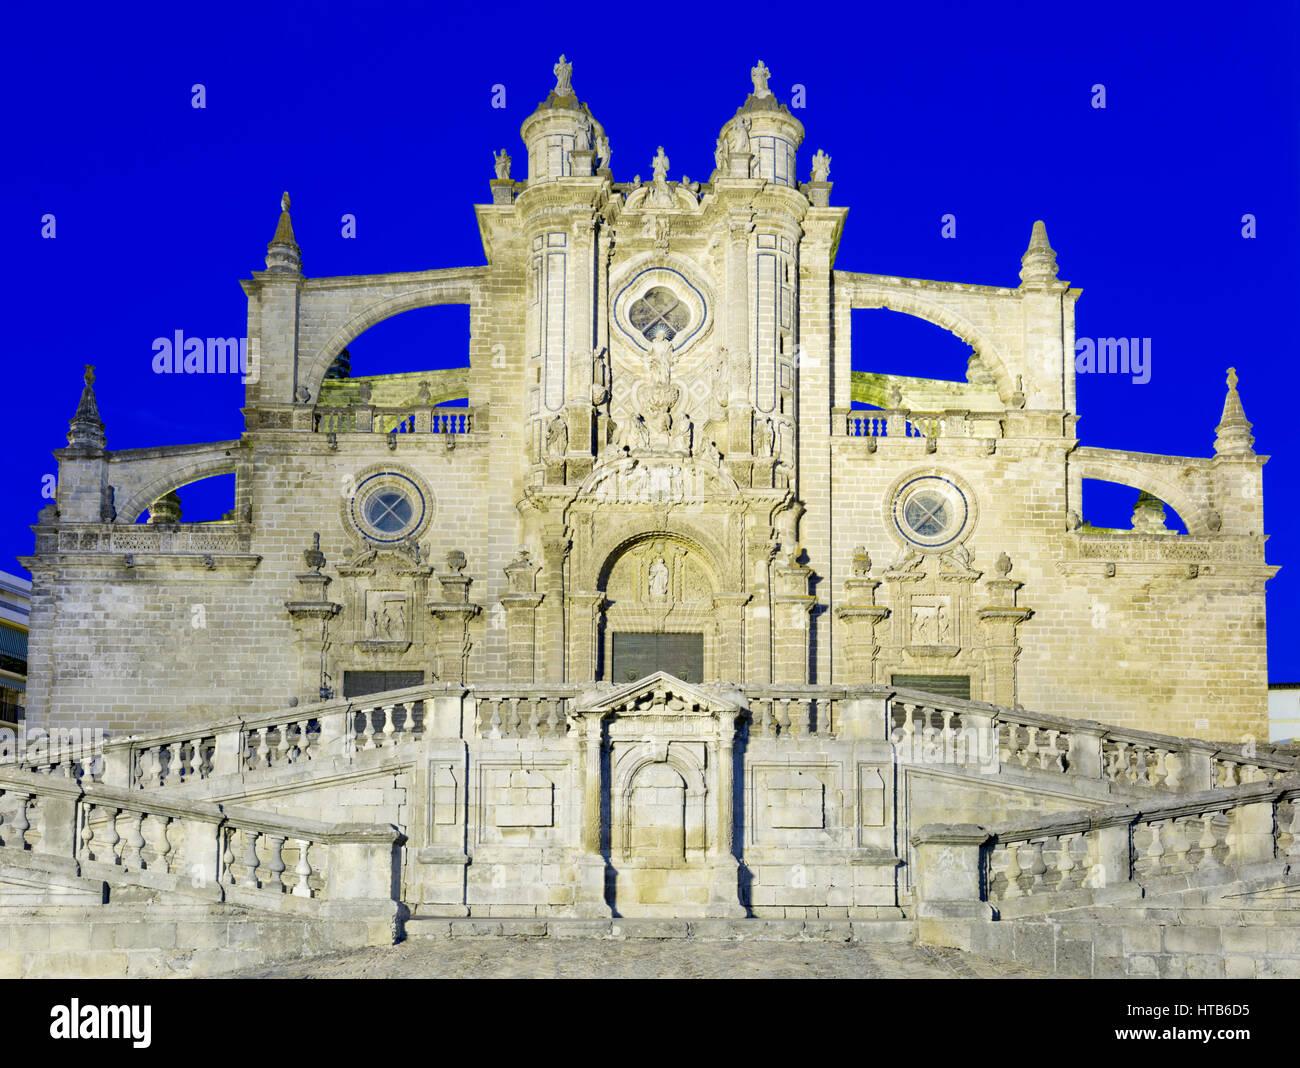 Kathedrale von San Salvador bei Nacht, Jerez De La Frontera, Cadiz Provinz, Andalusien, Spanien, Europa Stockbild